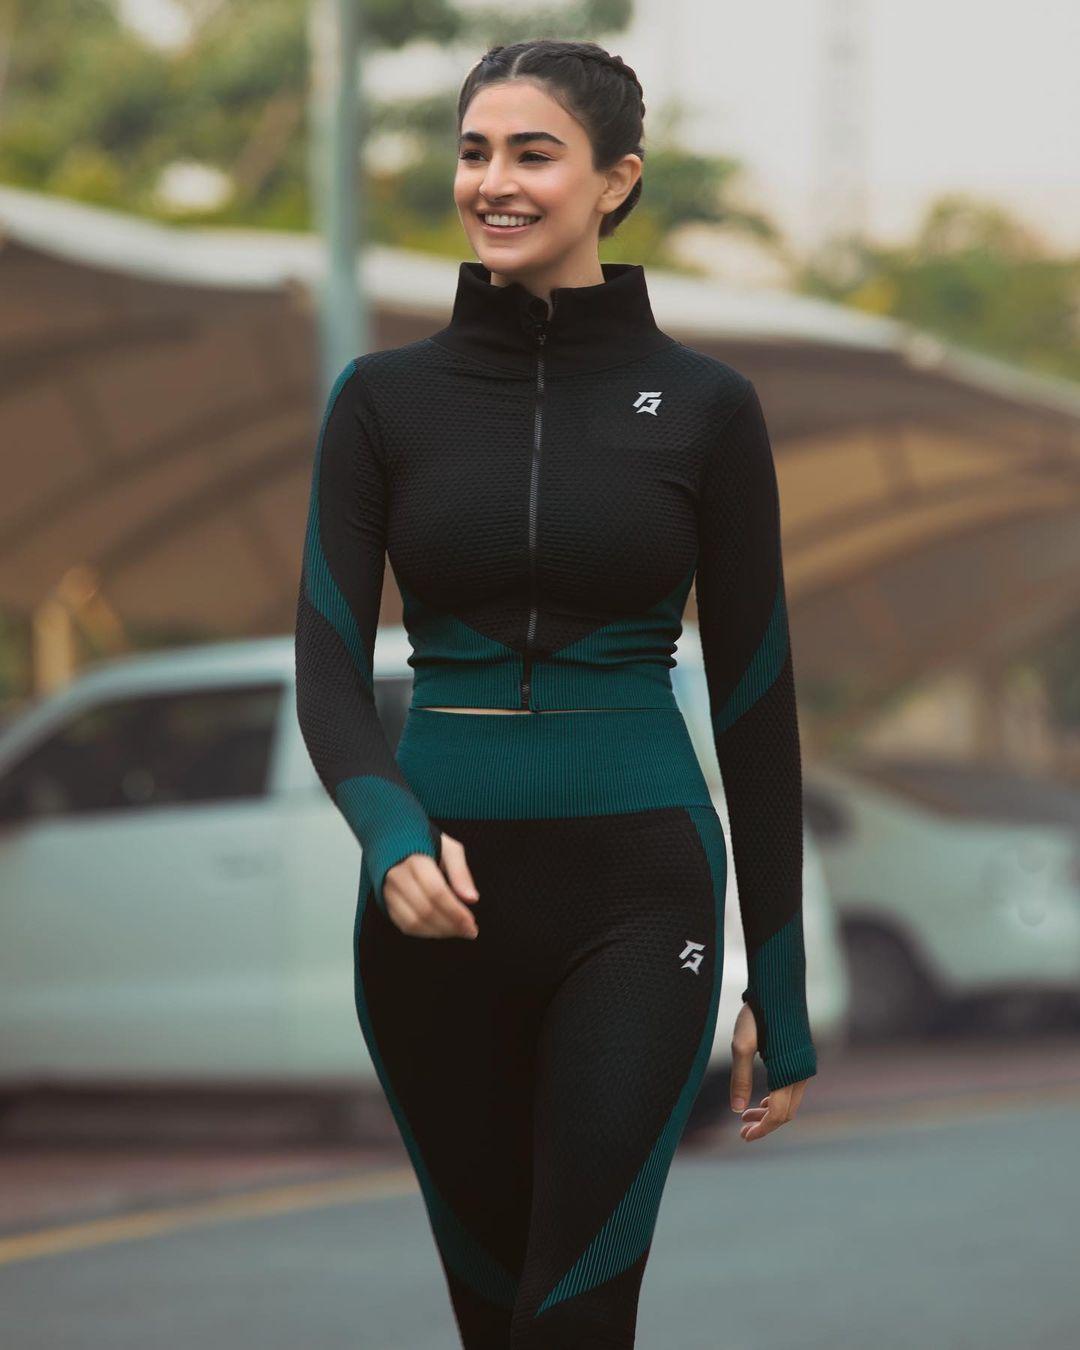 Actress and Model Saheefa Jabbar Clicks in Gym Wear